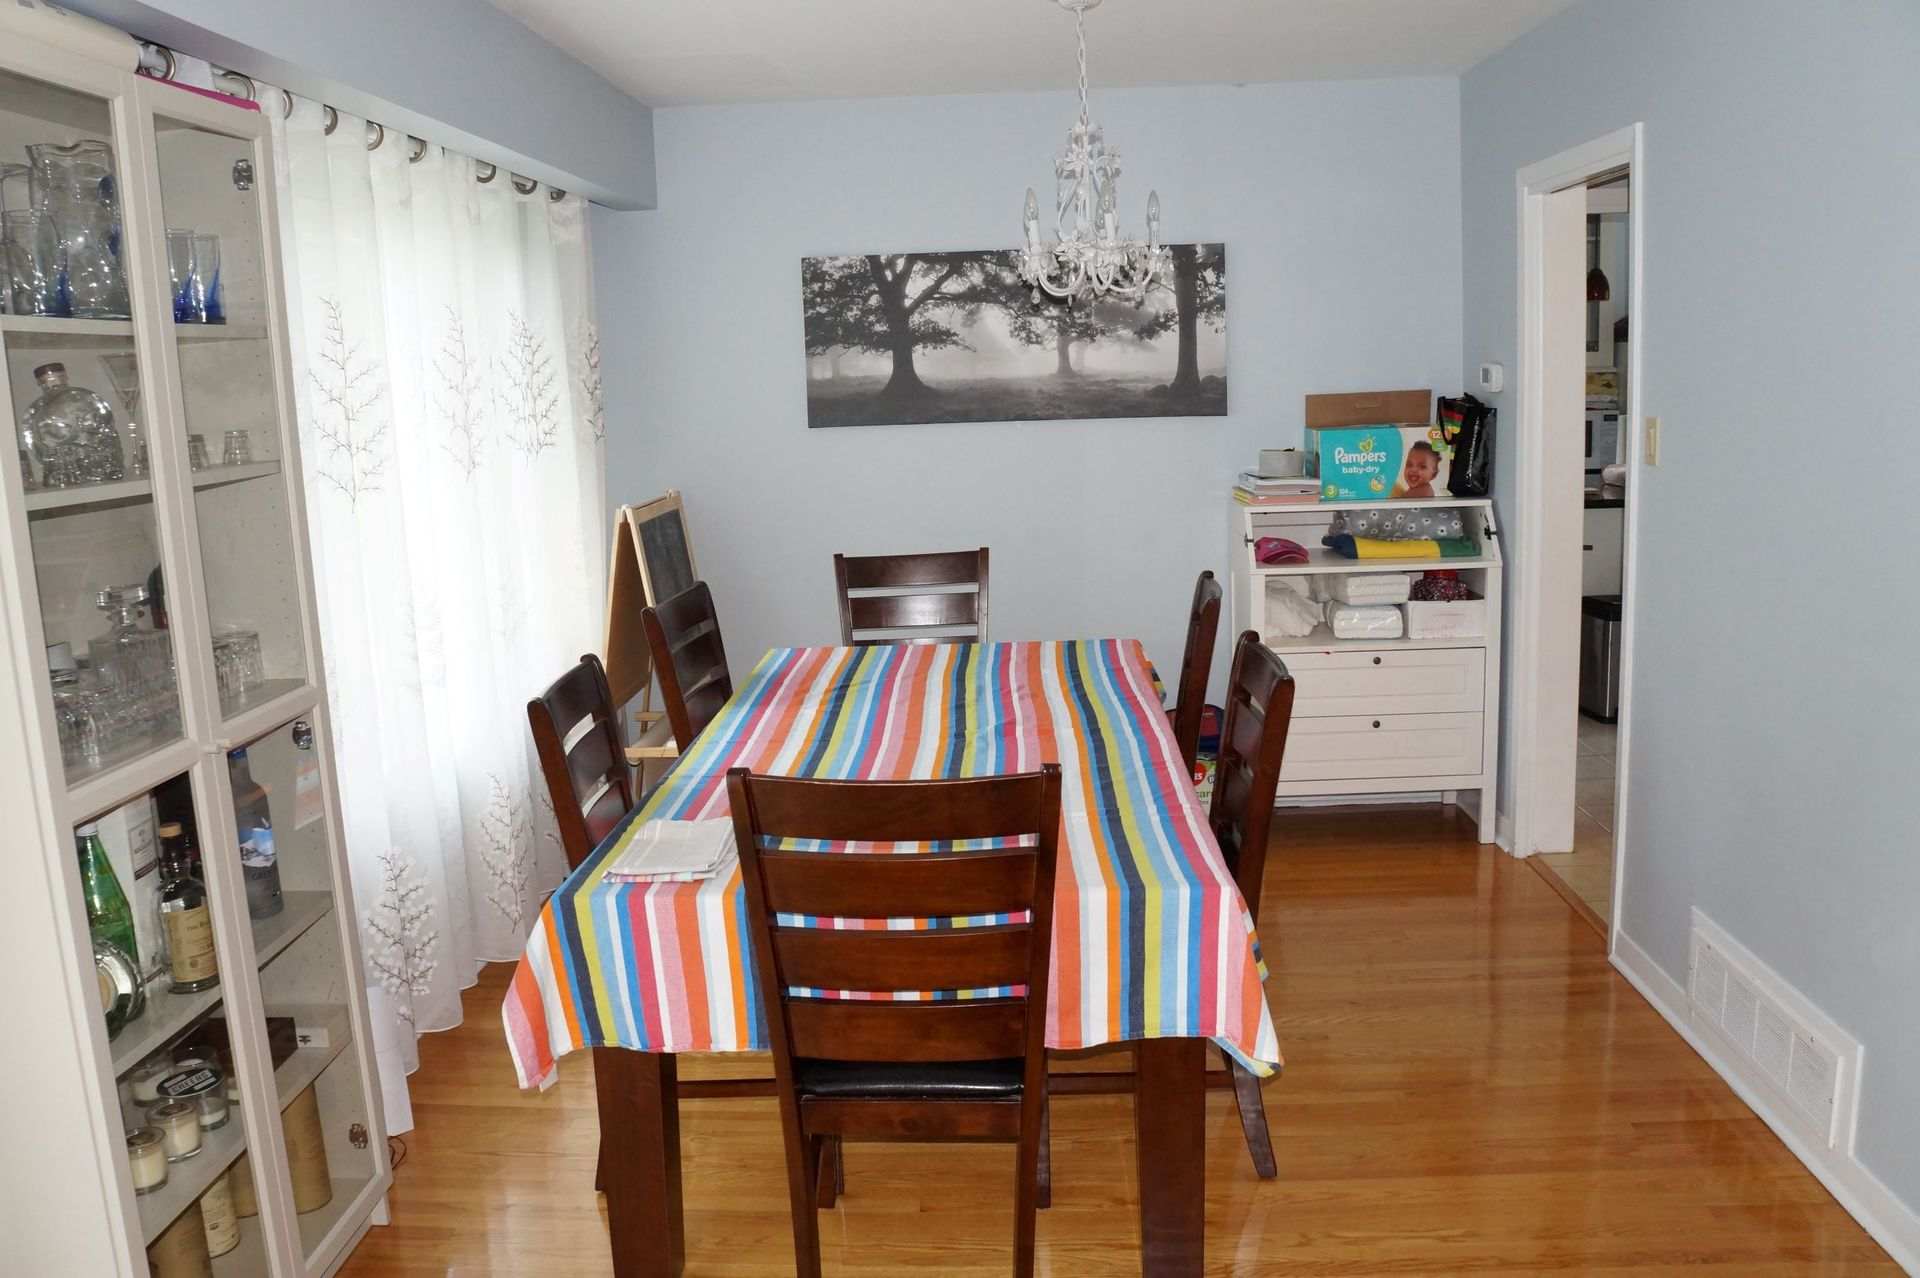 diningroom at 1 Knollview Crescent, Bayview Village, Toronto